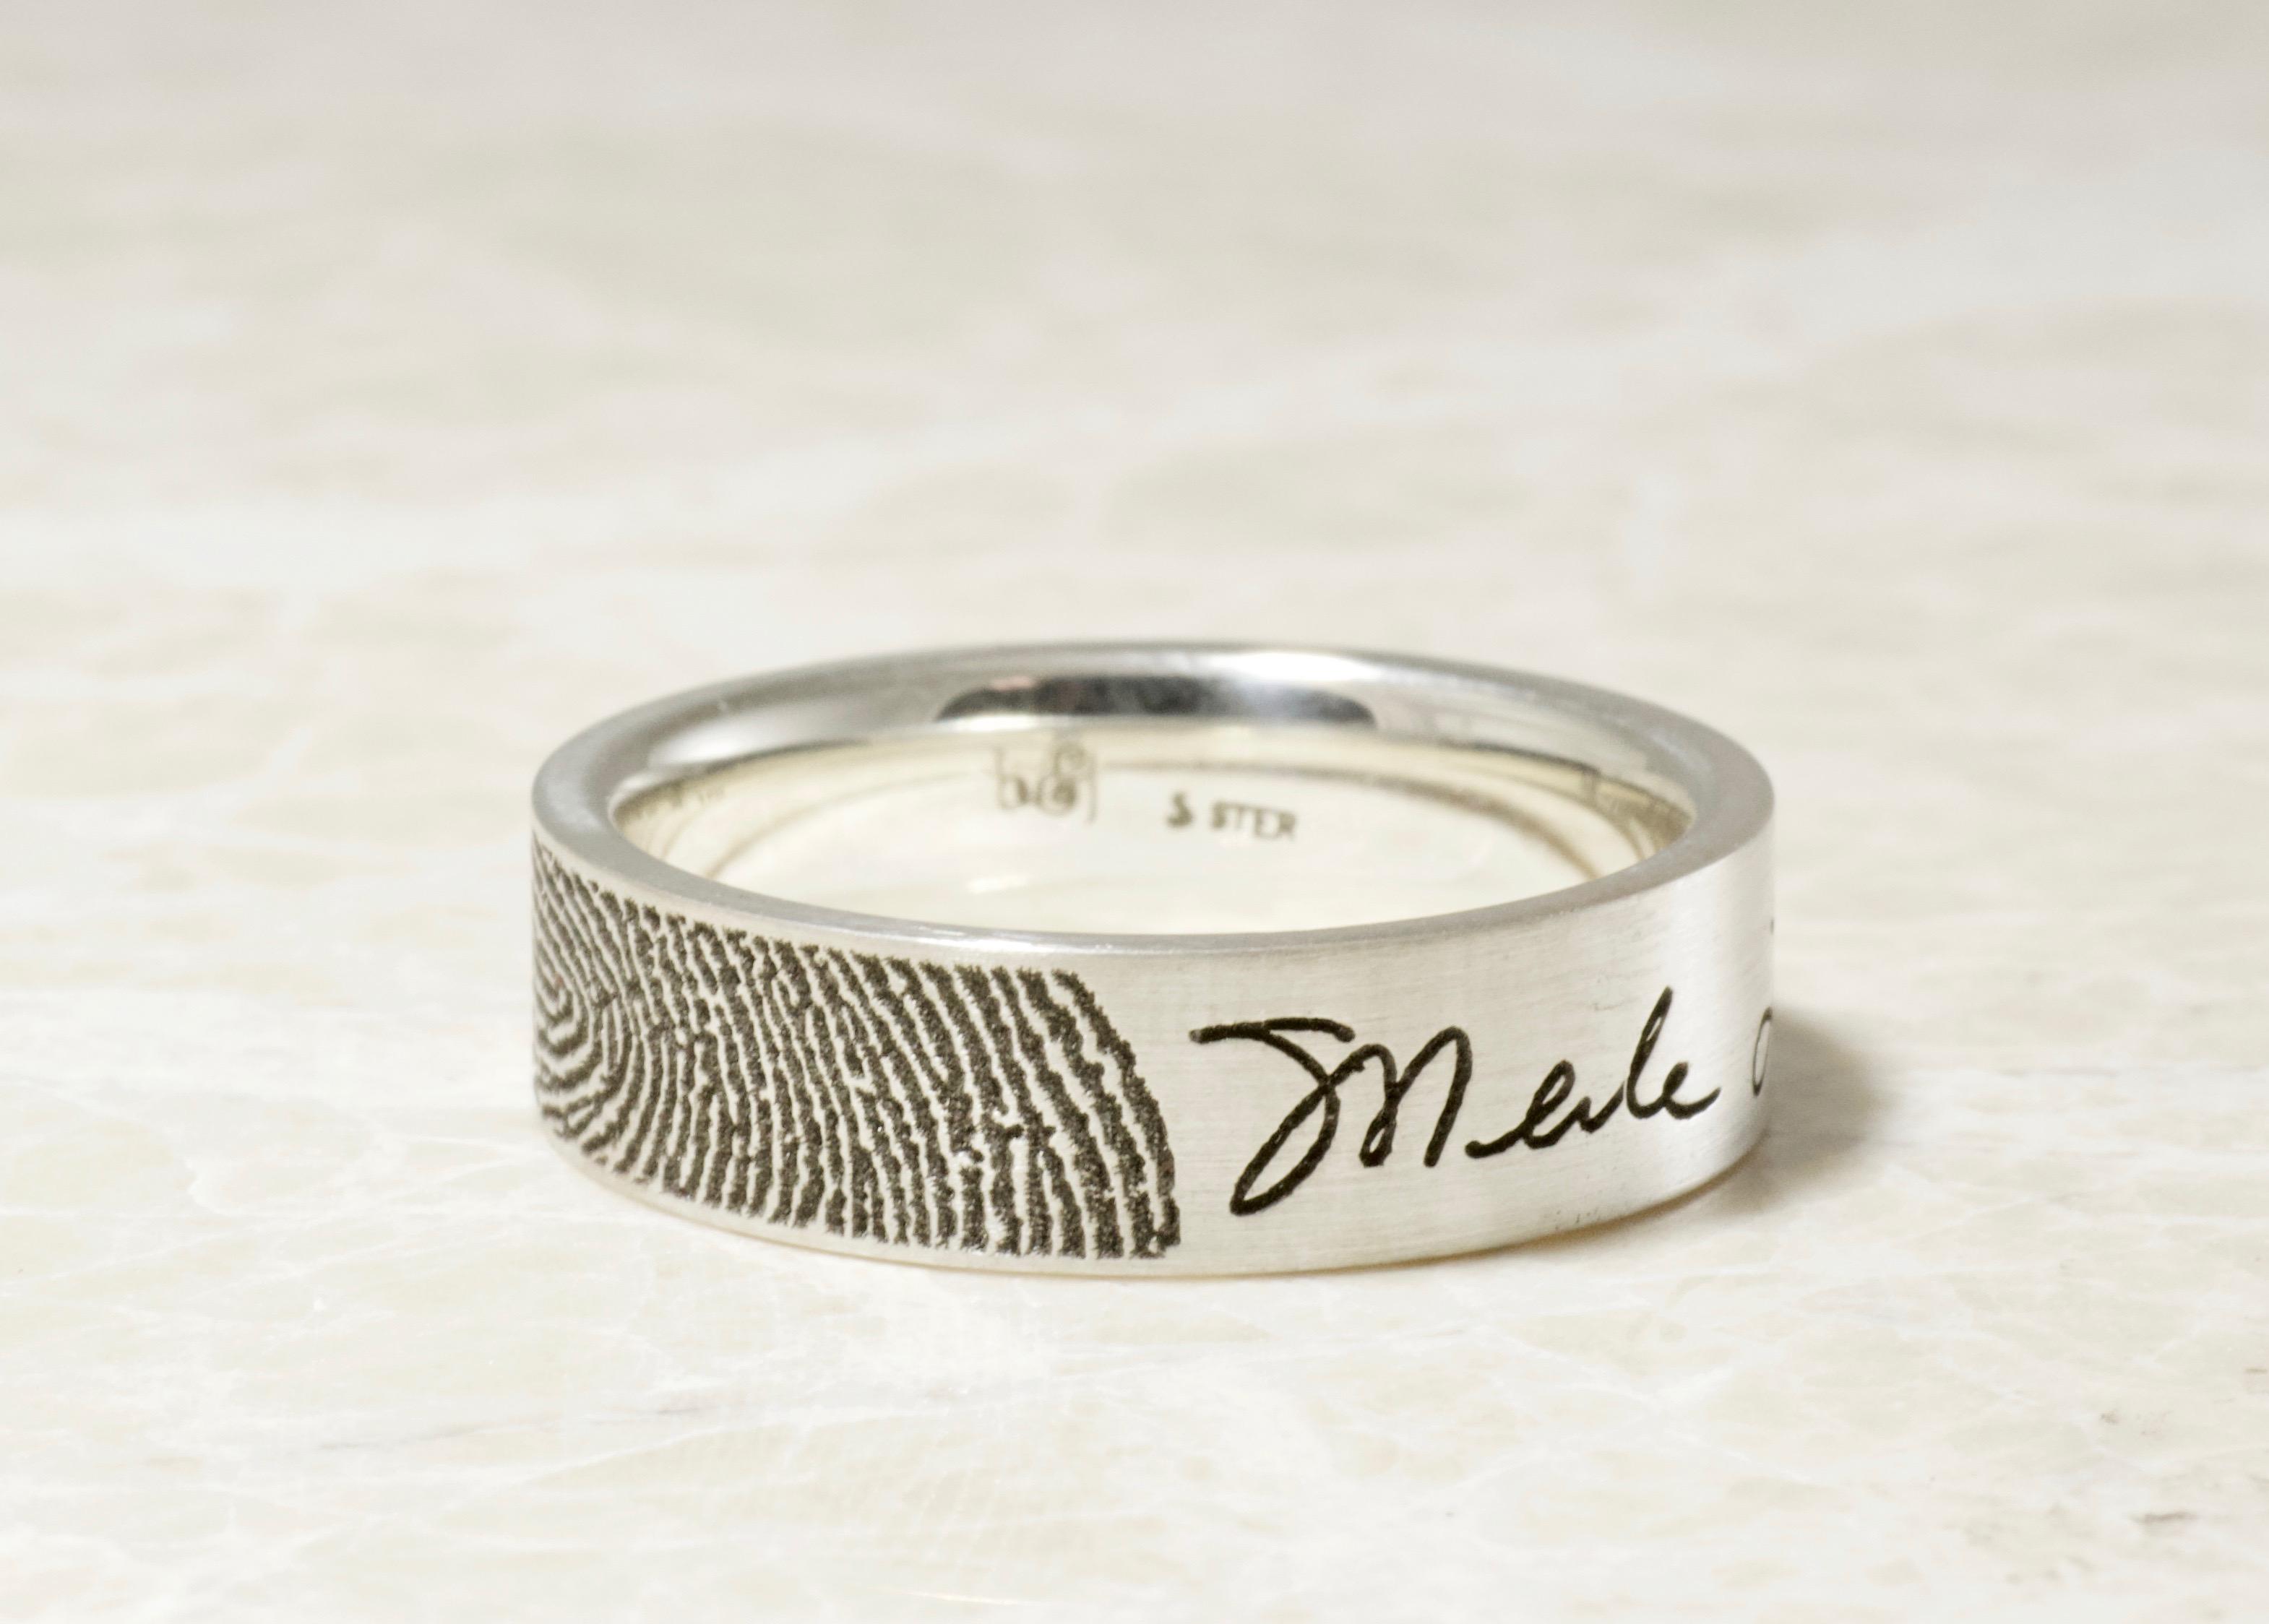 Custom Memorial fingerprint and signature ring by Brent&Jess 6mm comfort fit flat